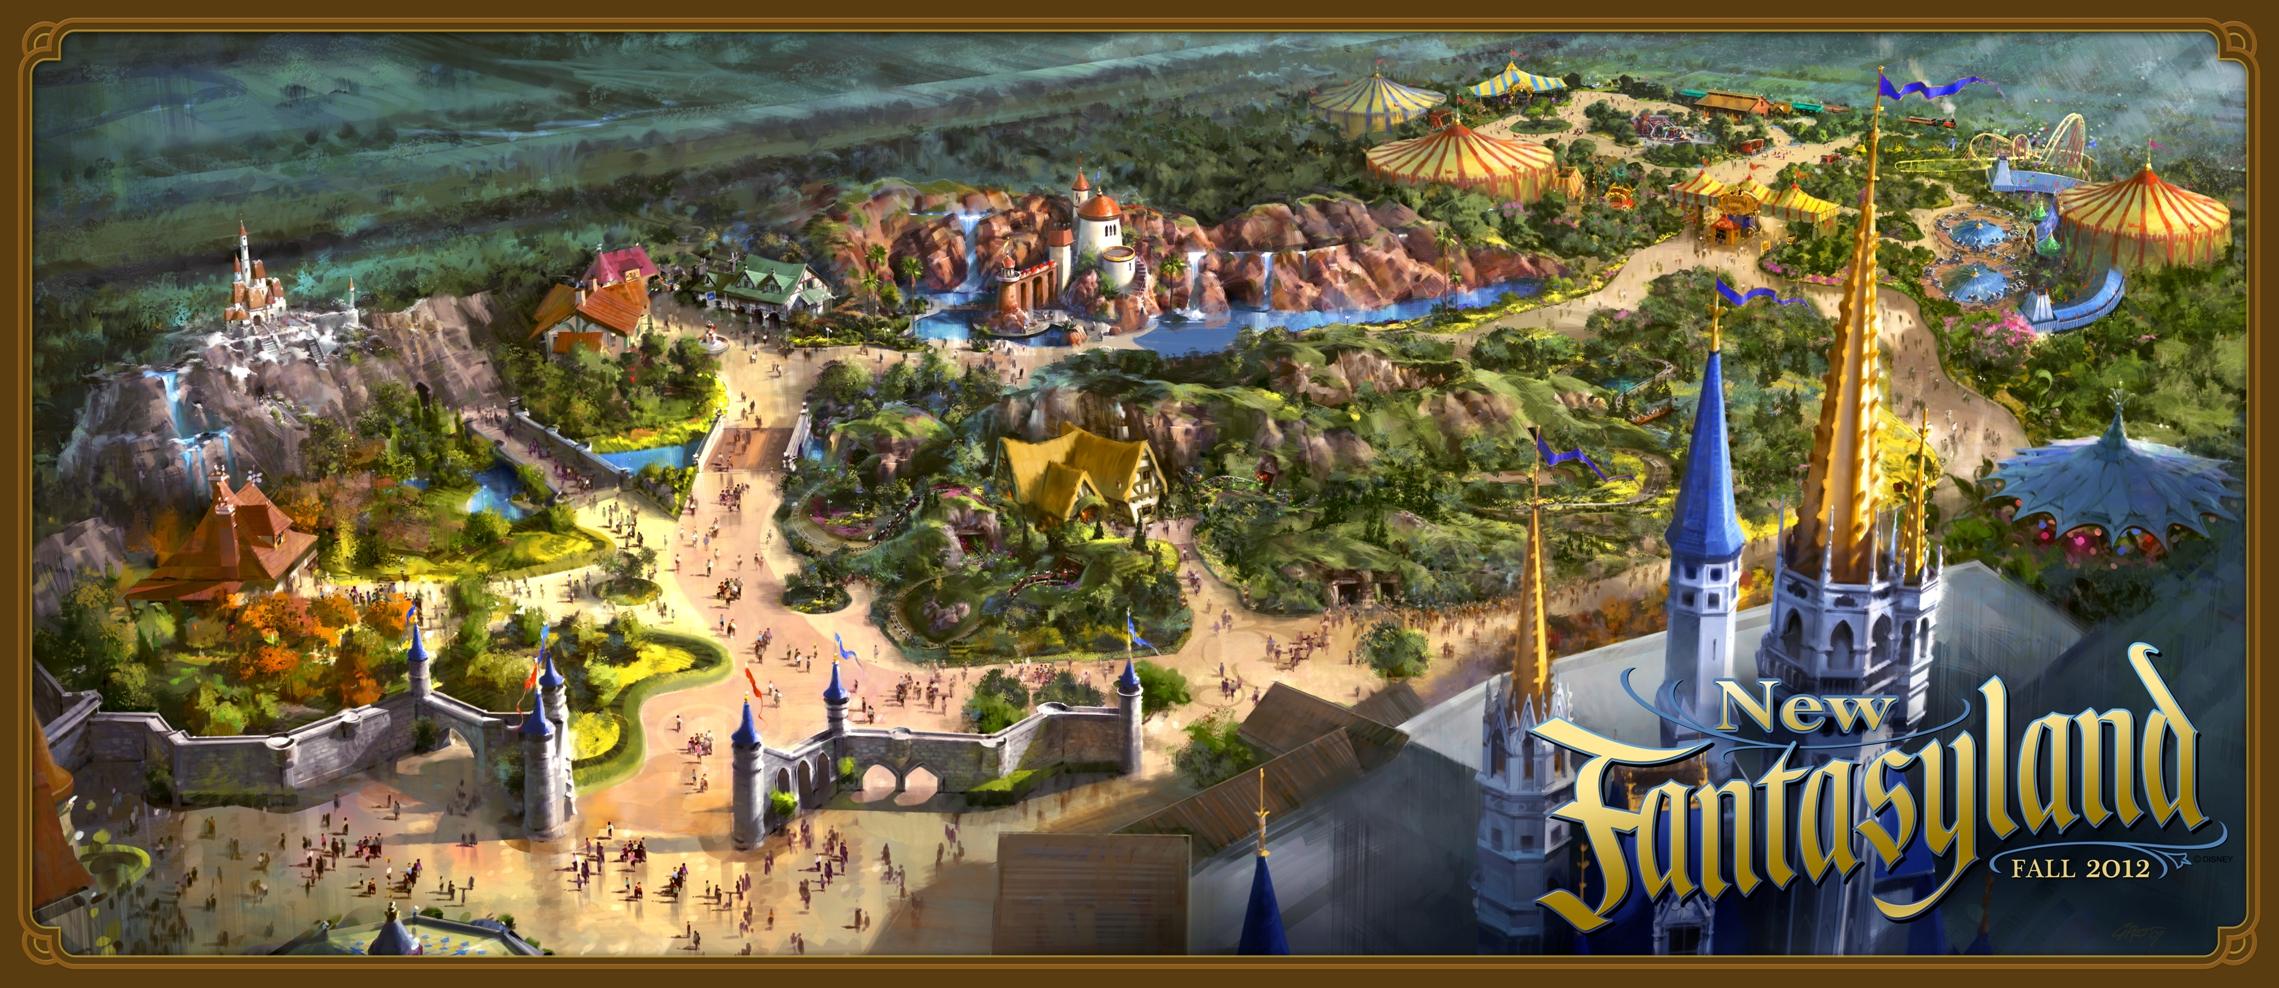 Major Disney Theme Park Updates Announced - Disney News